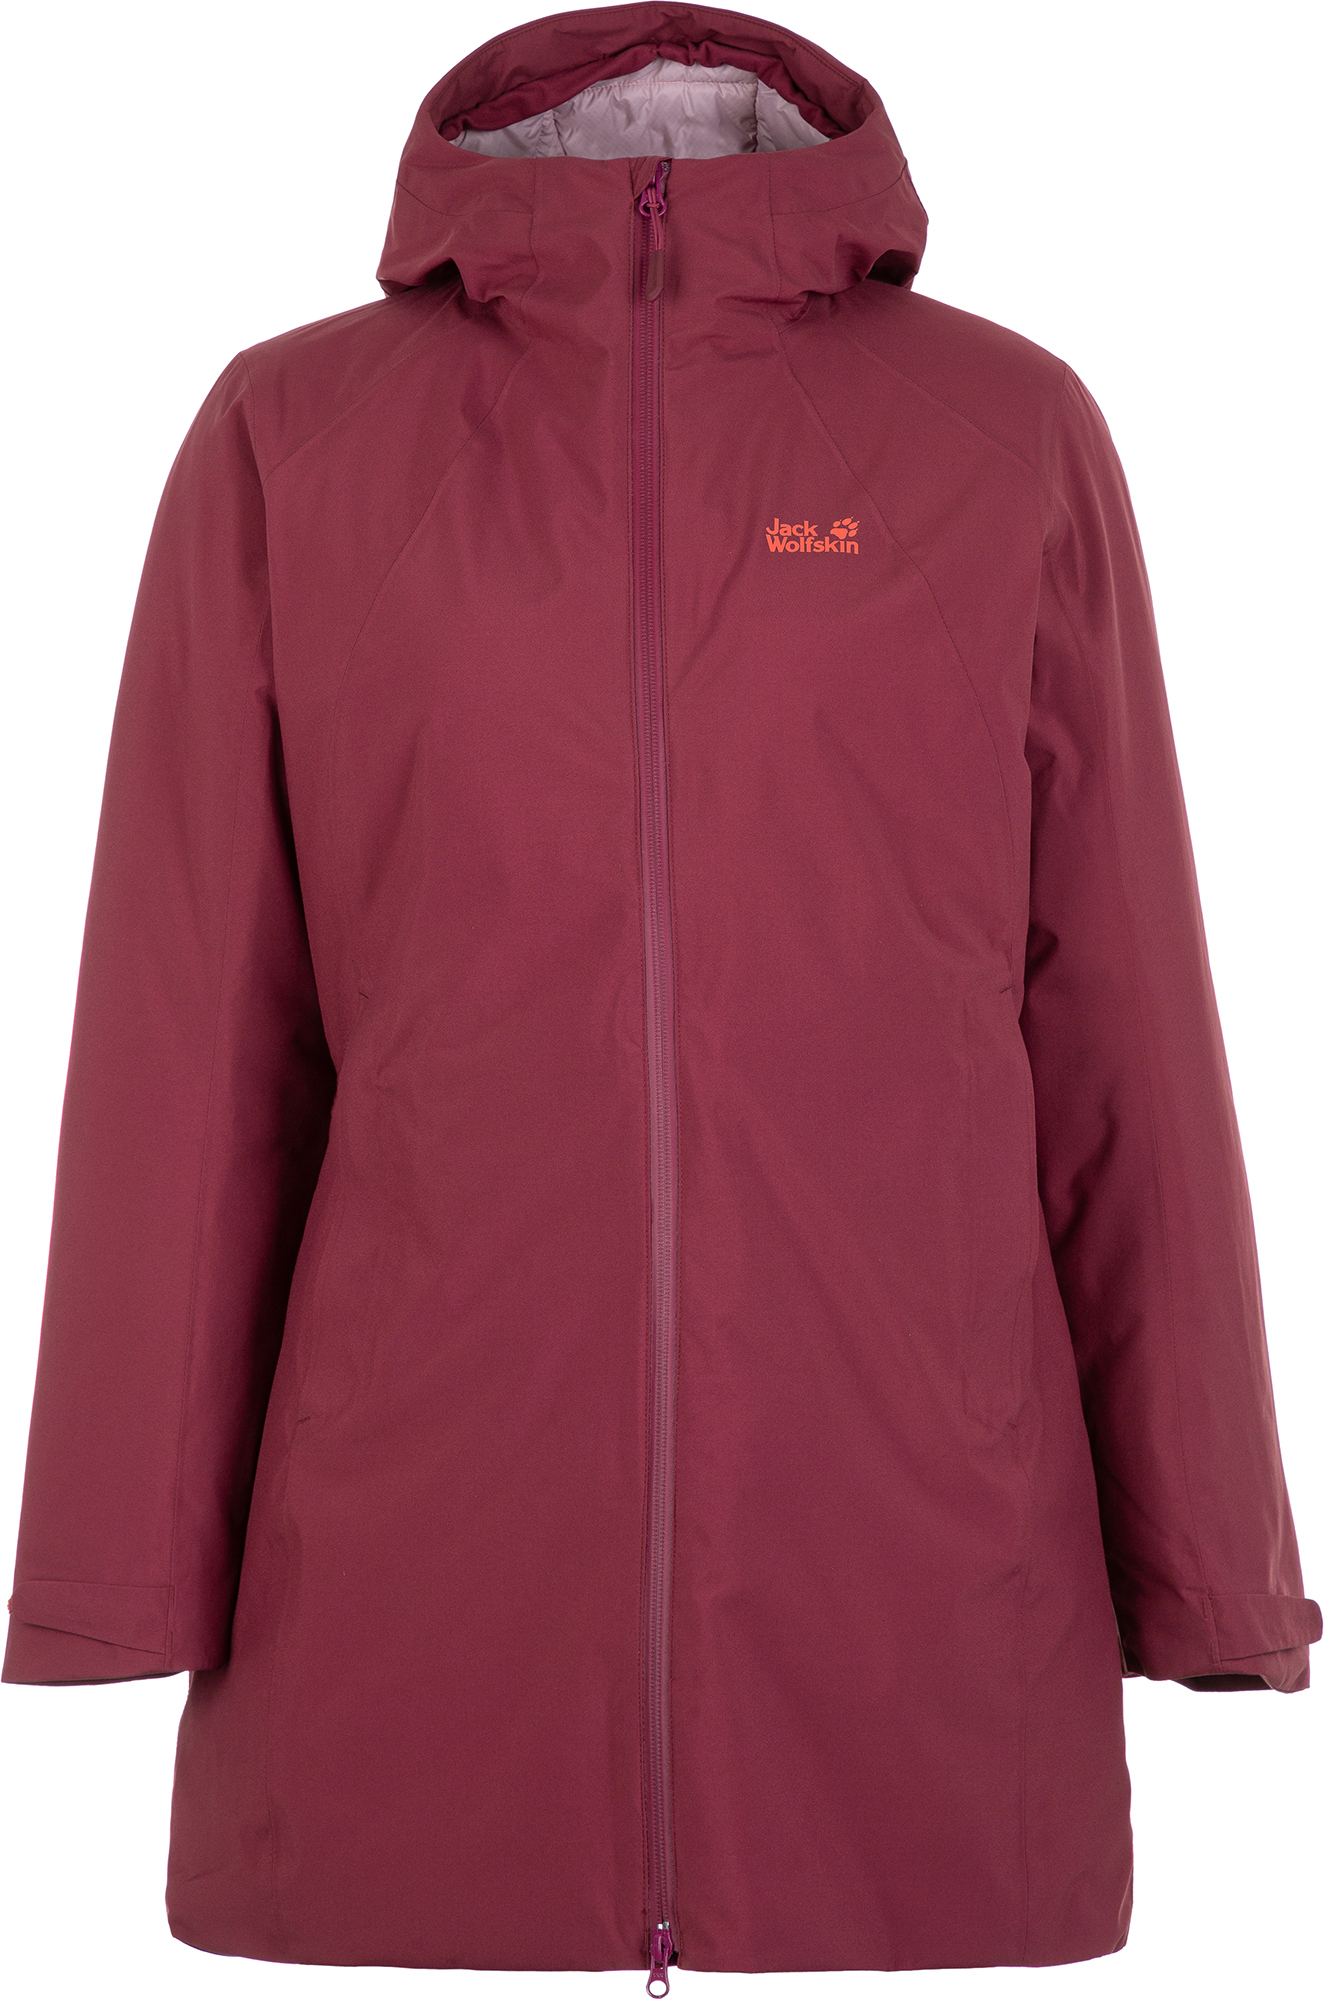 Jack Wolfskin Куртка утепленная женская Astana, размер 52-54